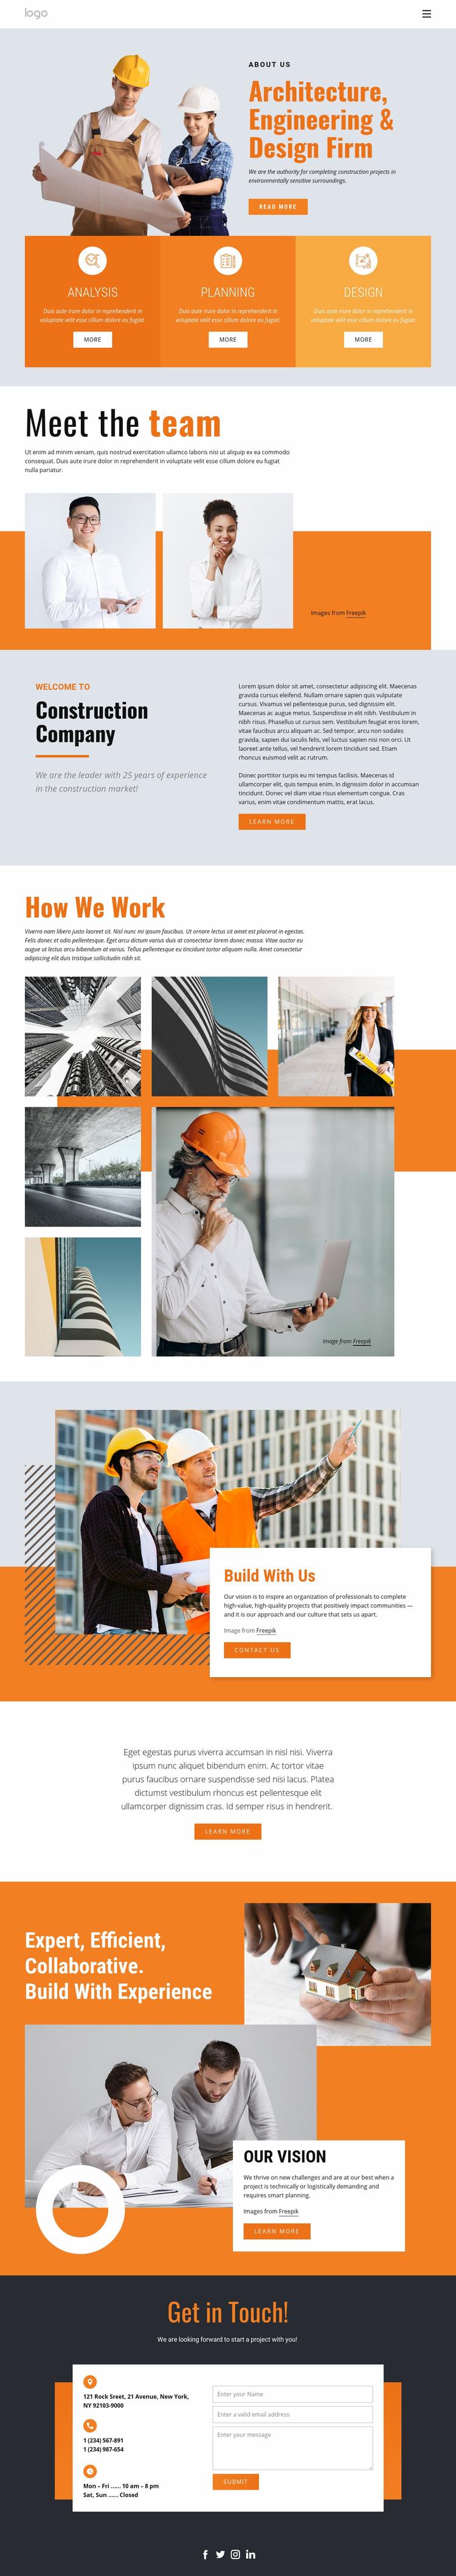 Engineering firm Web Page Designer